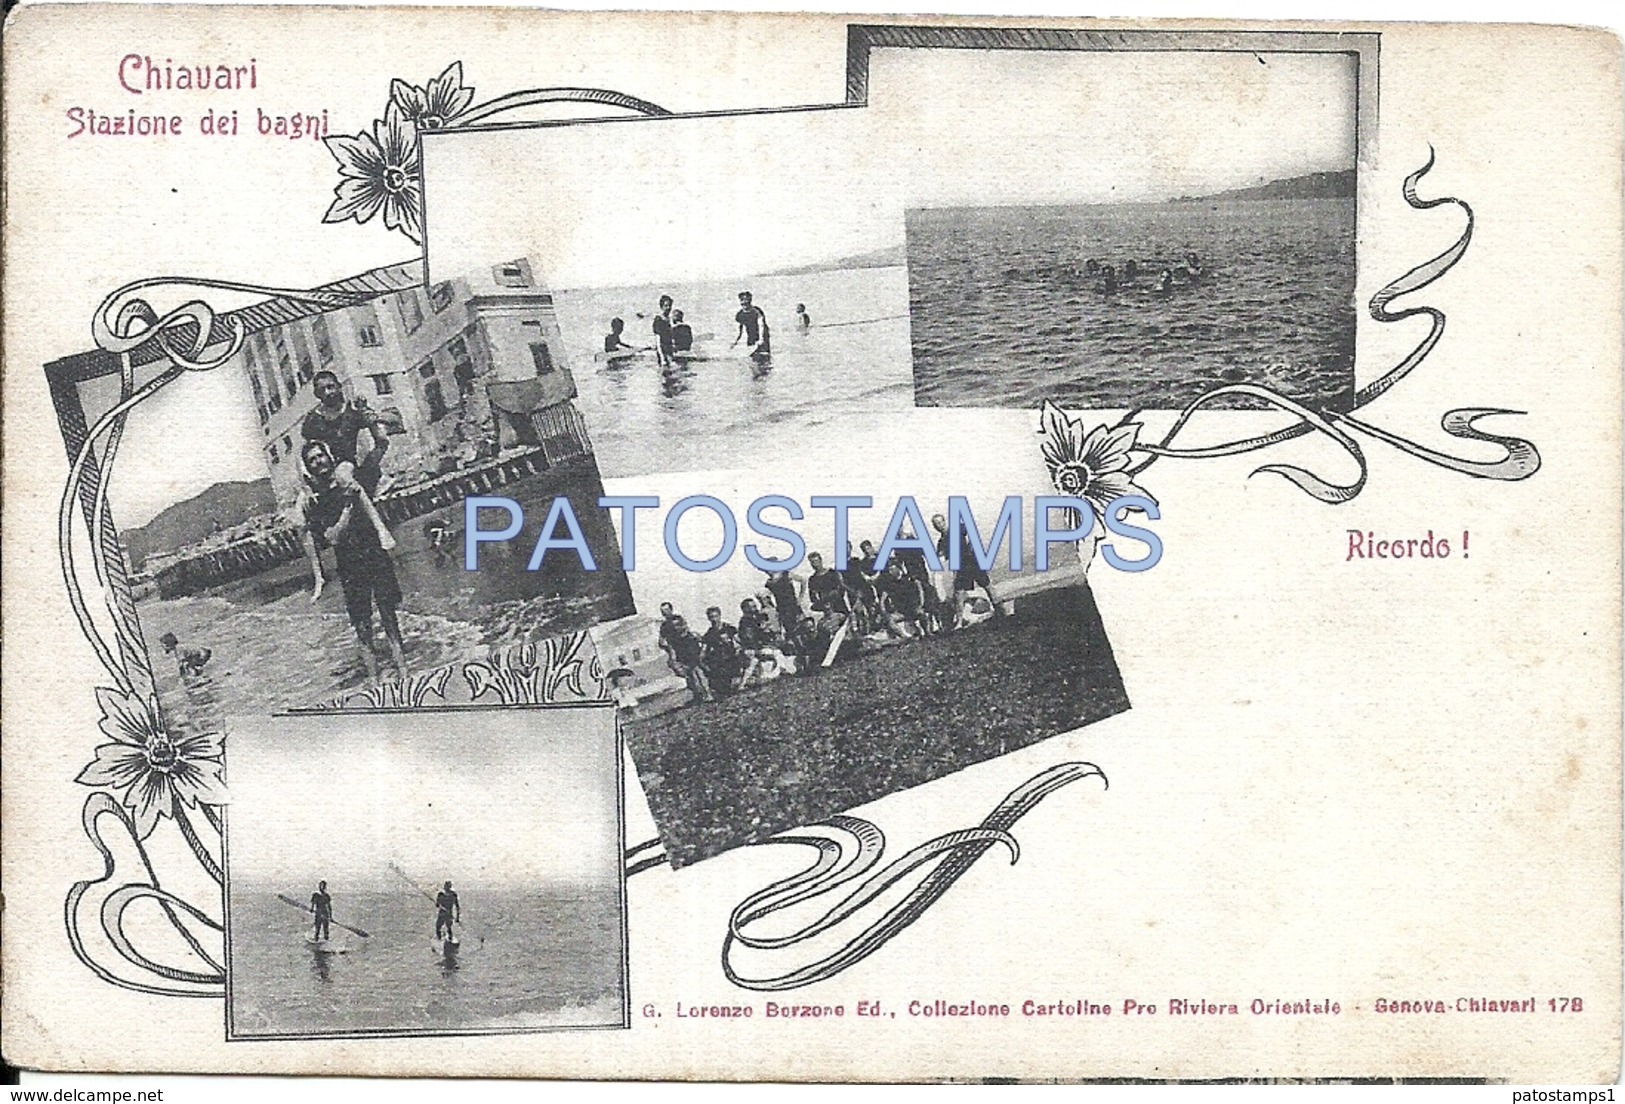 66728 ITALY CHIAVARI GENOVA STATION BATHS MULTI VIEW POSTAL POSTCARD - Non Classés